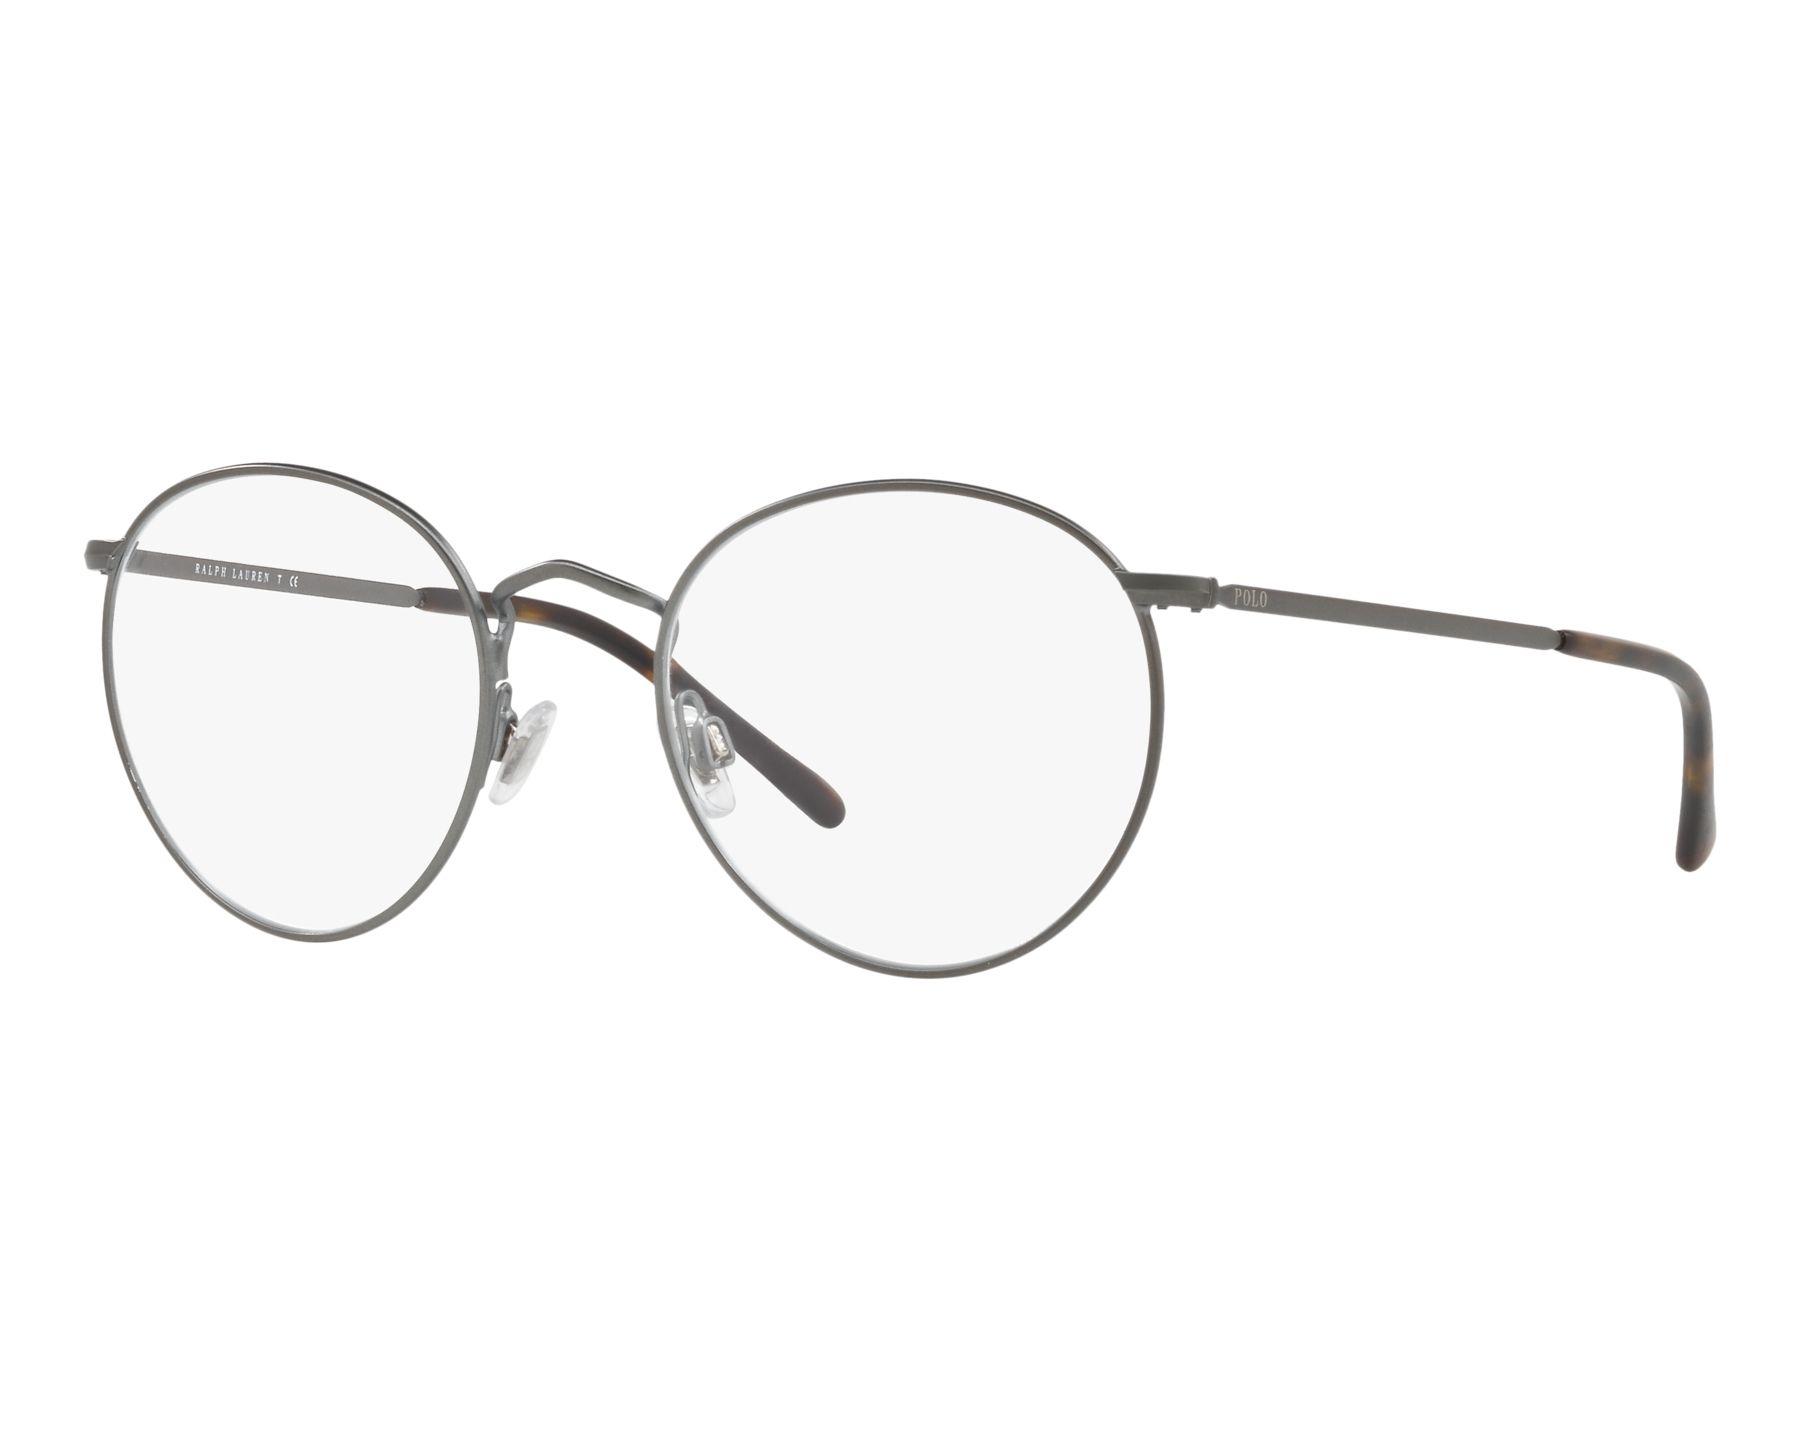 Polo Ralph Lauren Eyeglasses PH-1179 9157| Buy now and